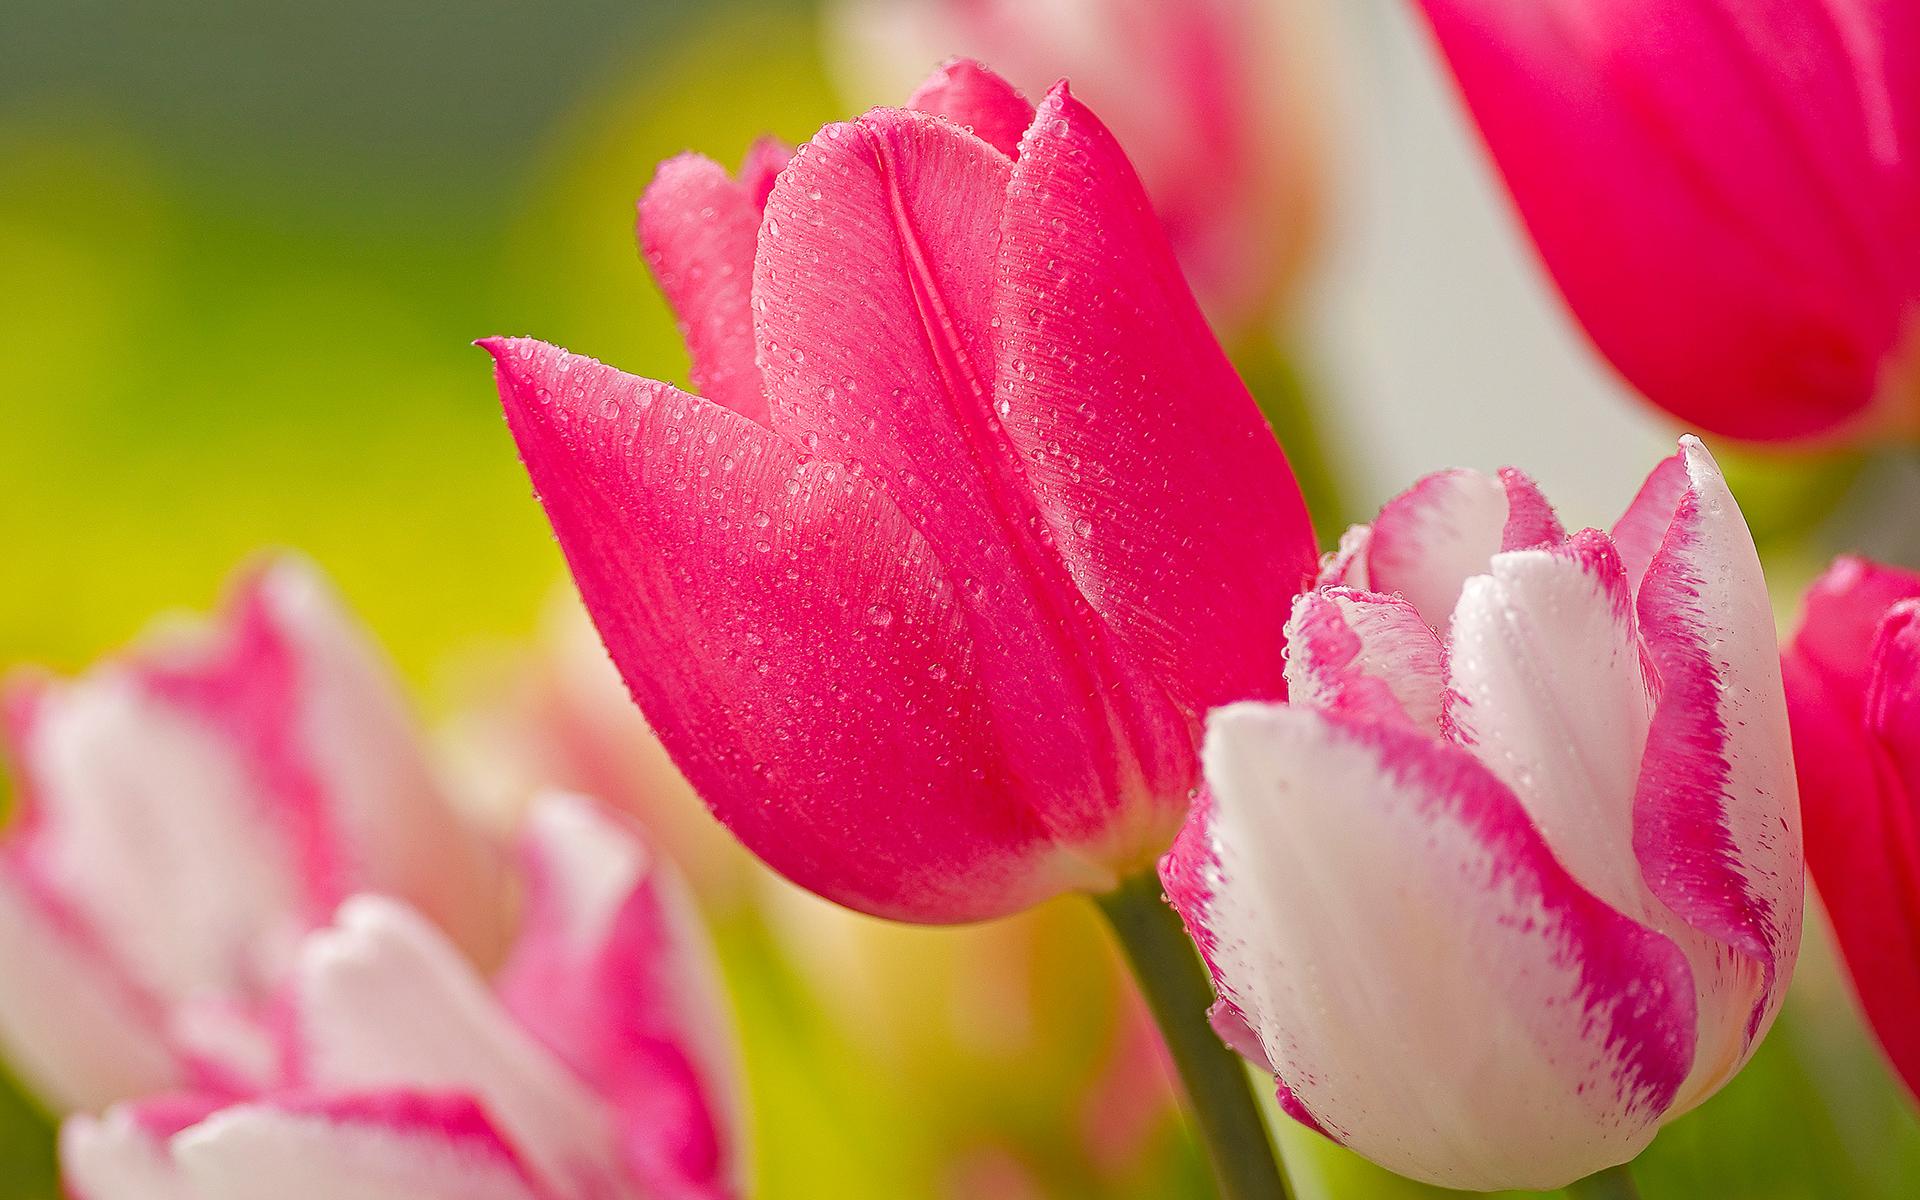 bright flowers pink images - HD Desktop Wallpapers | 4k HD